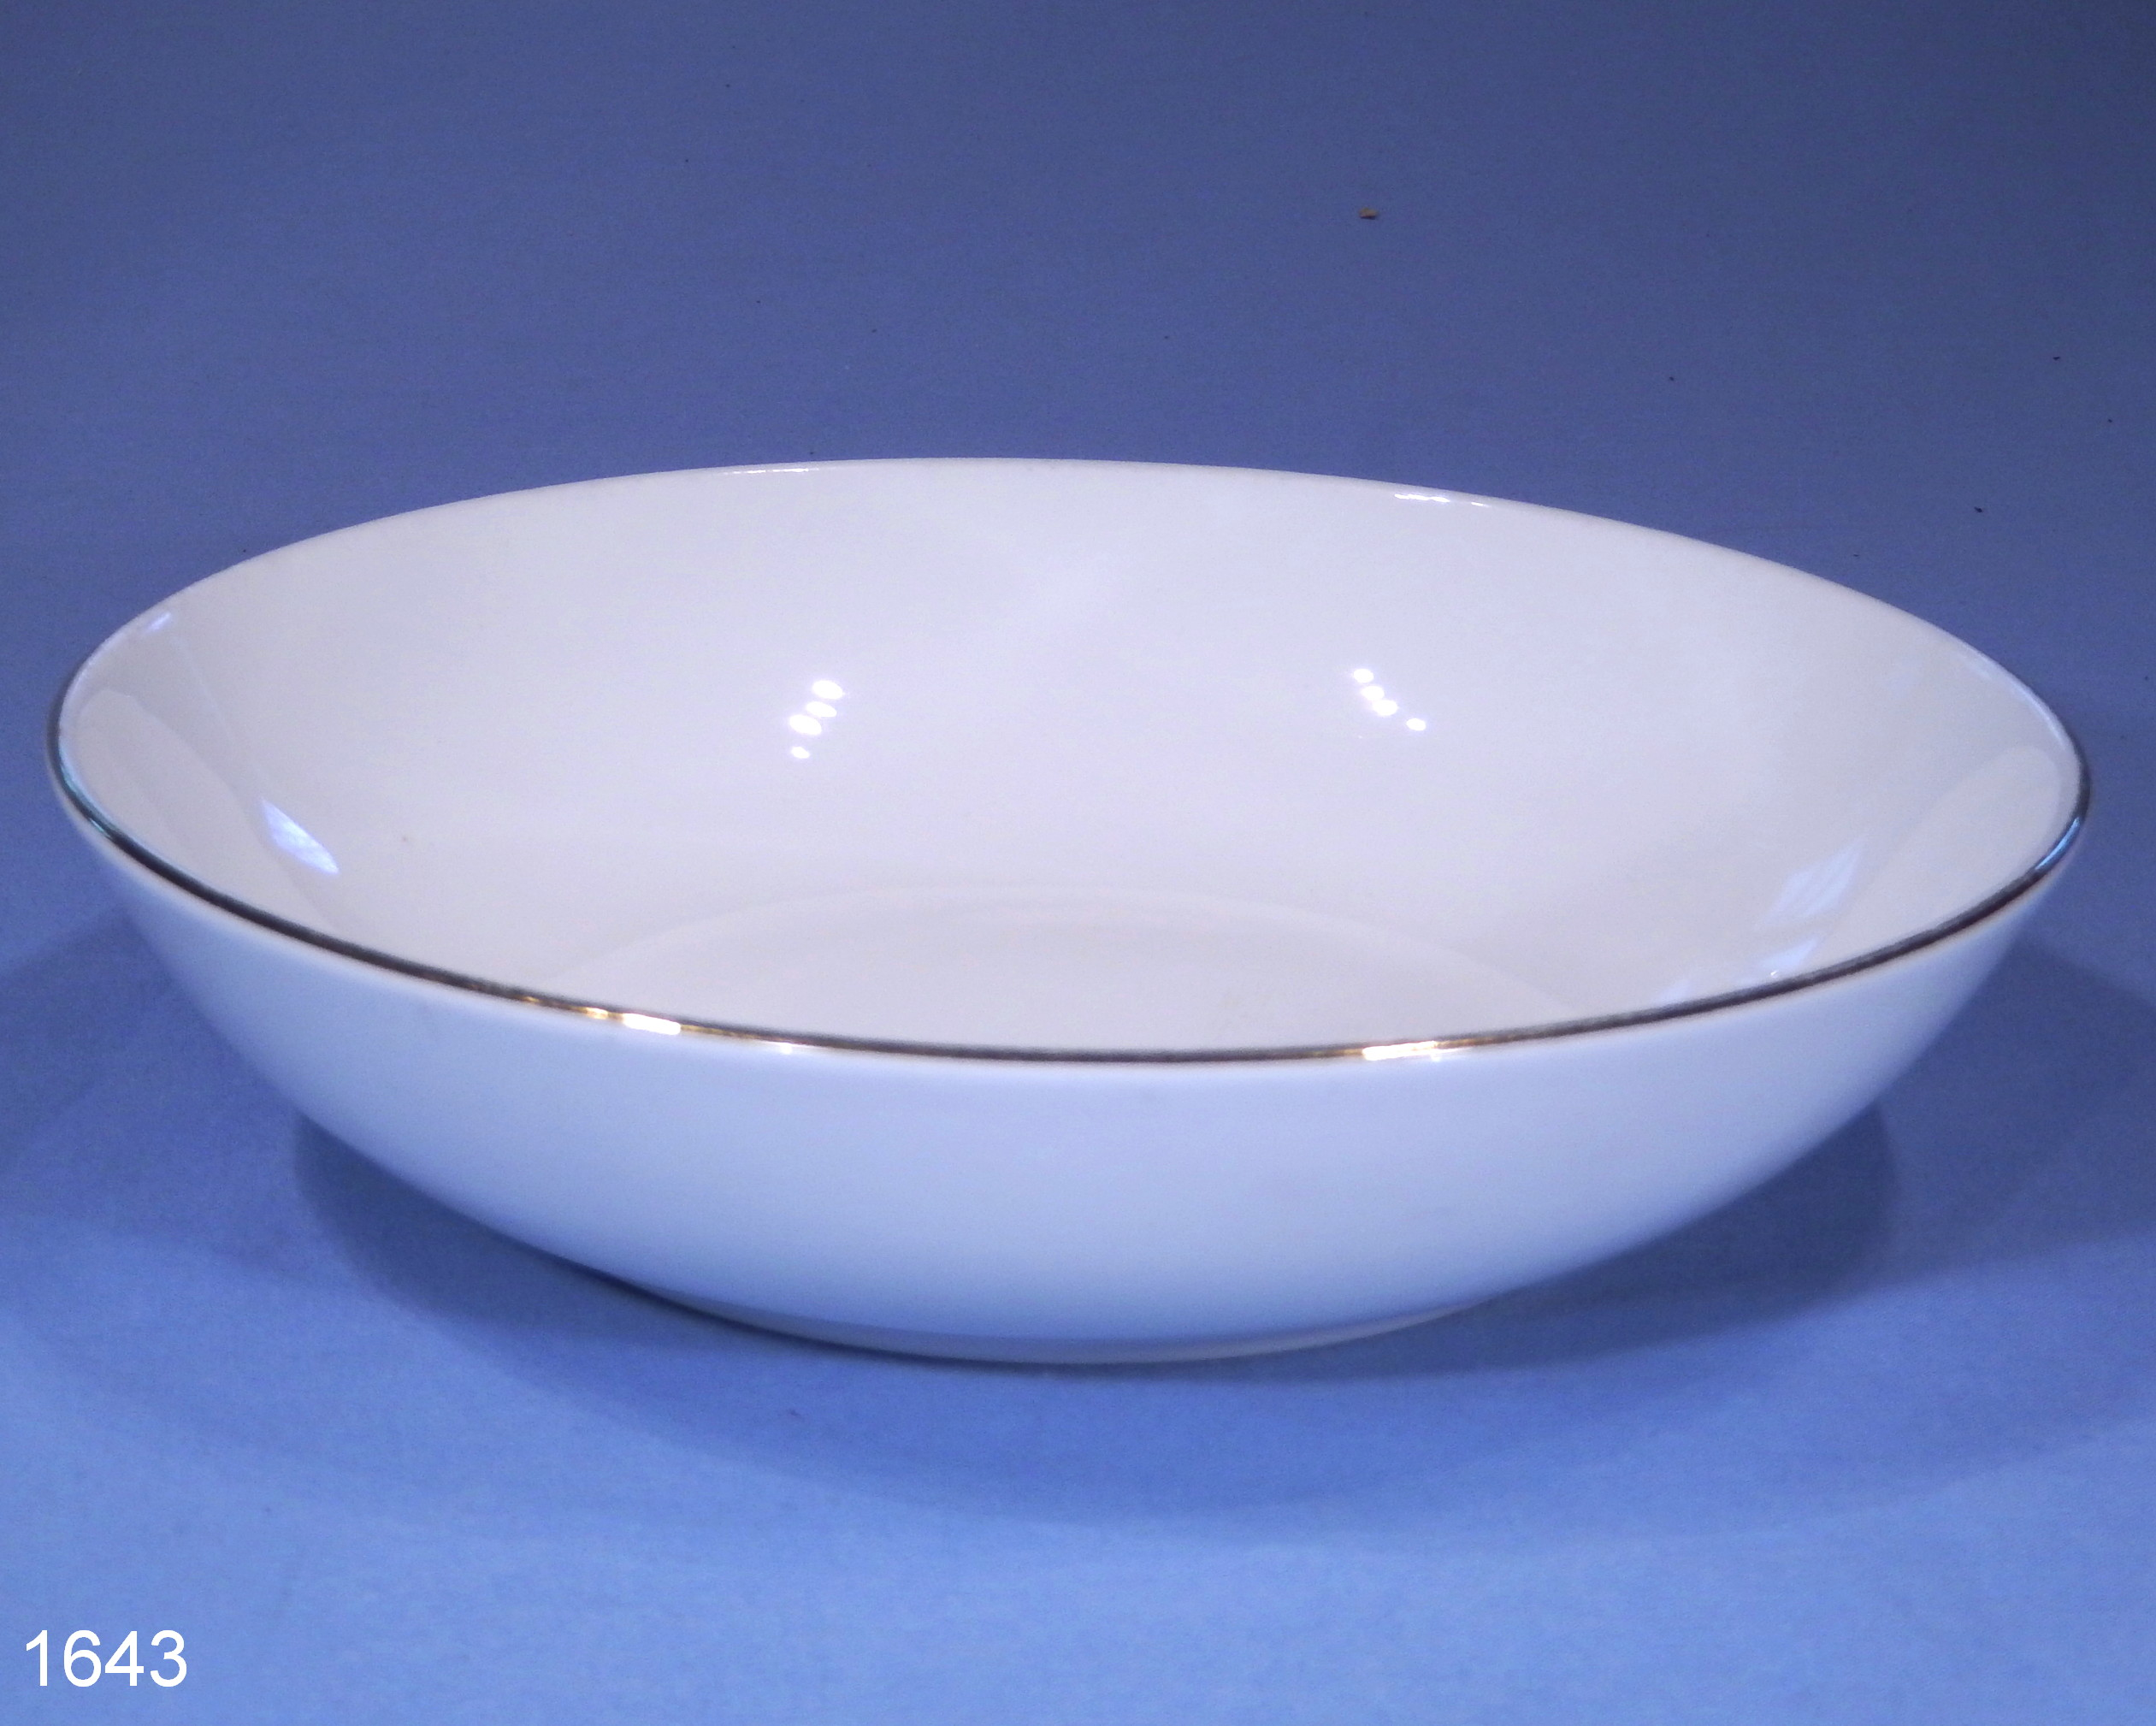 58 Porcelain Dinnerware, China Porcelain Chinaware 0394 Jade,bangle ...